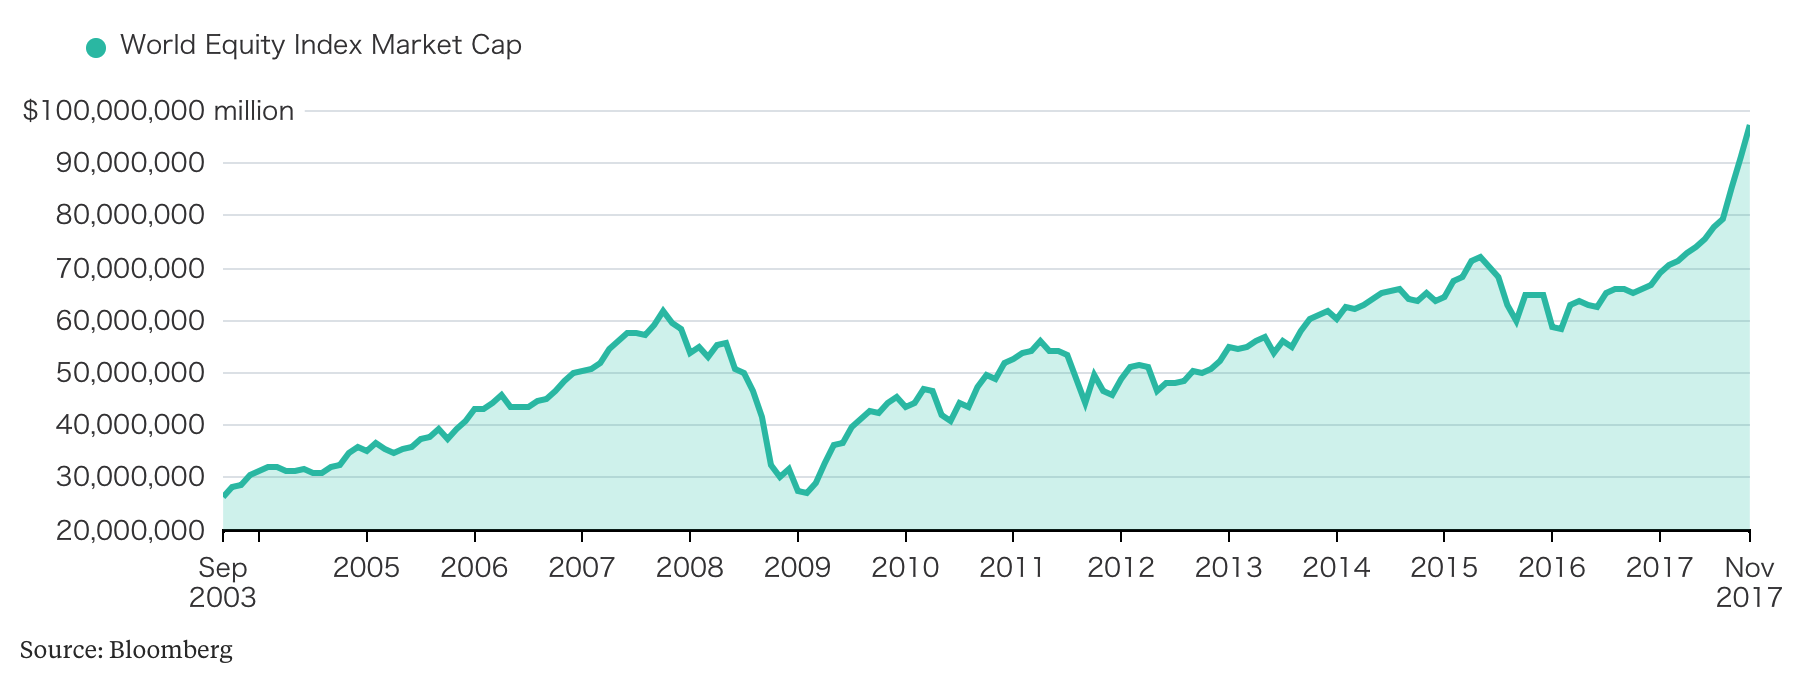 World Equity Index Market Cap, Sep 2003 - Nov 2017